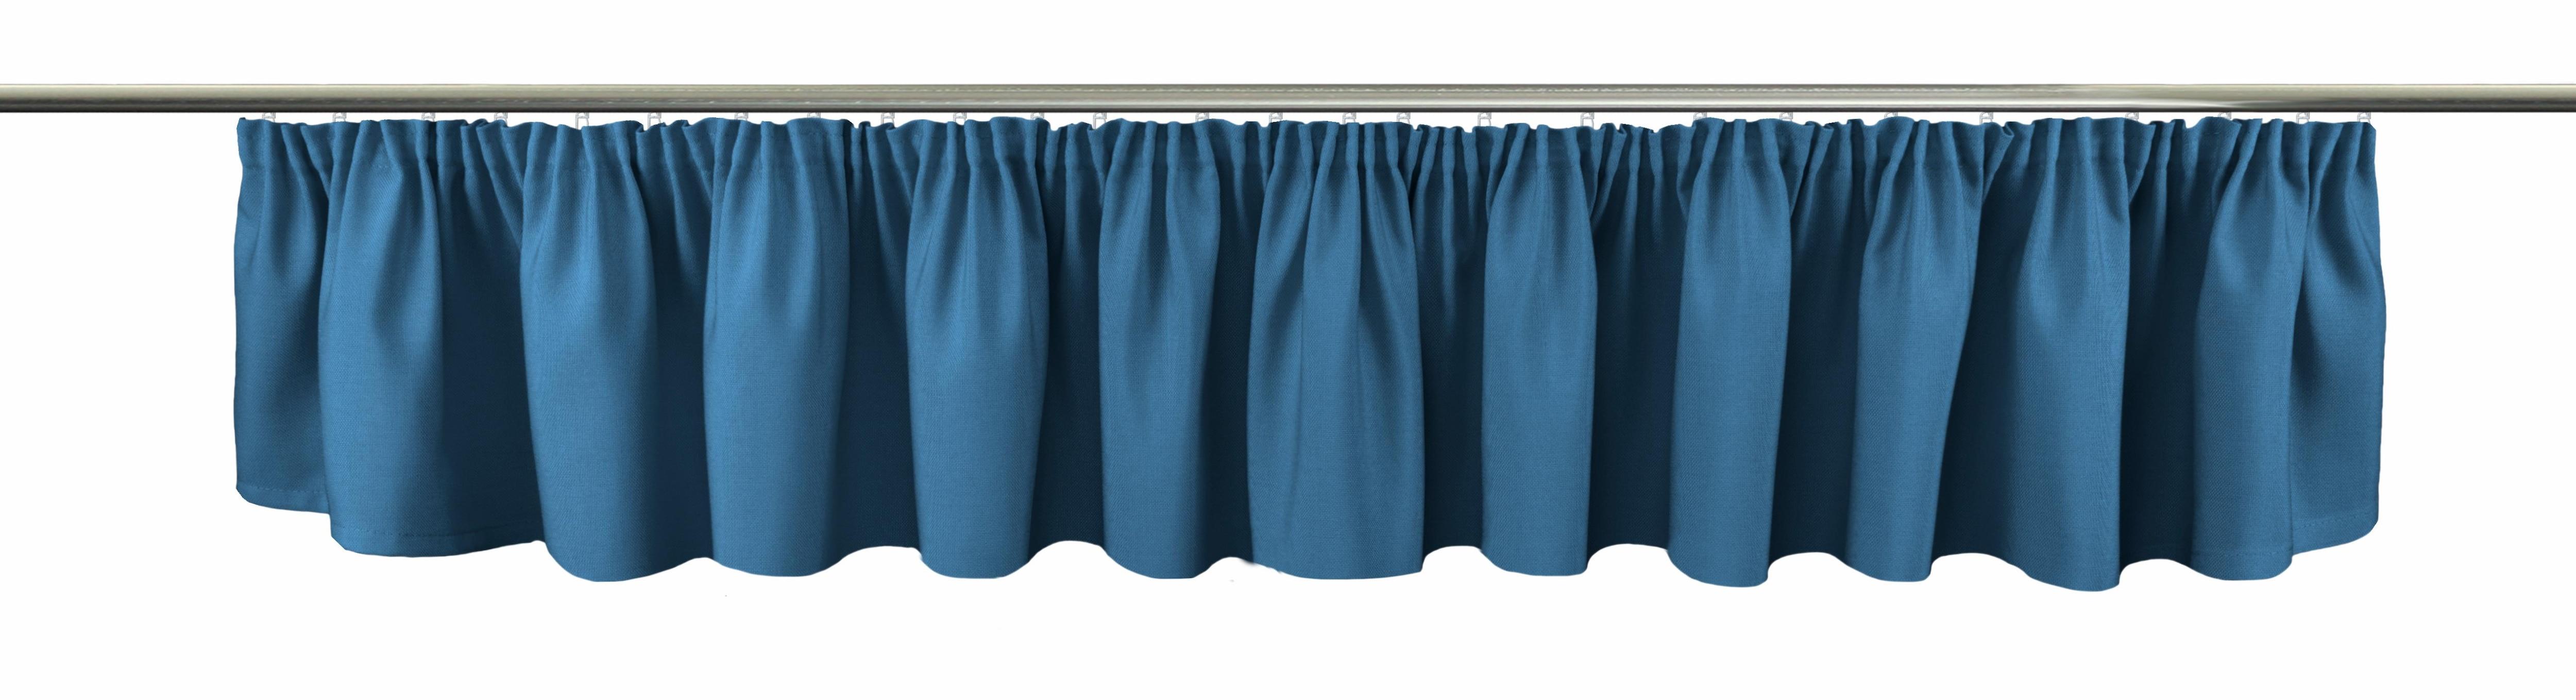 Querbehang Gerti VHG Kräuselband 1 Stück | Heimtextilien > Gardinen und Vorhänge > Scheibengardinen | Blau | Vhg